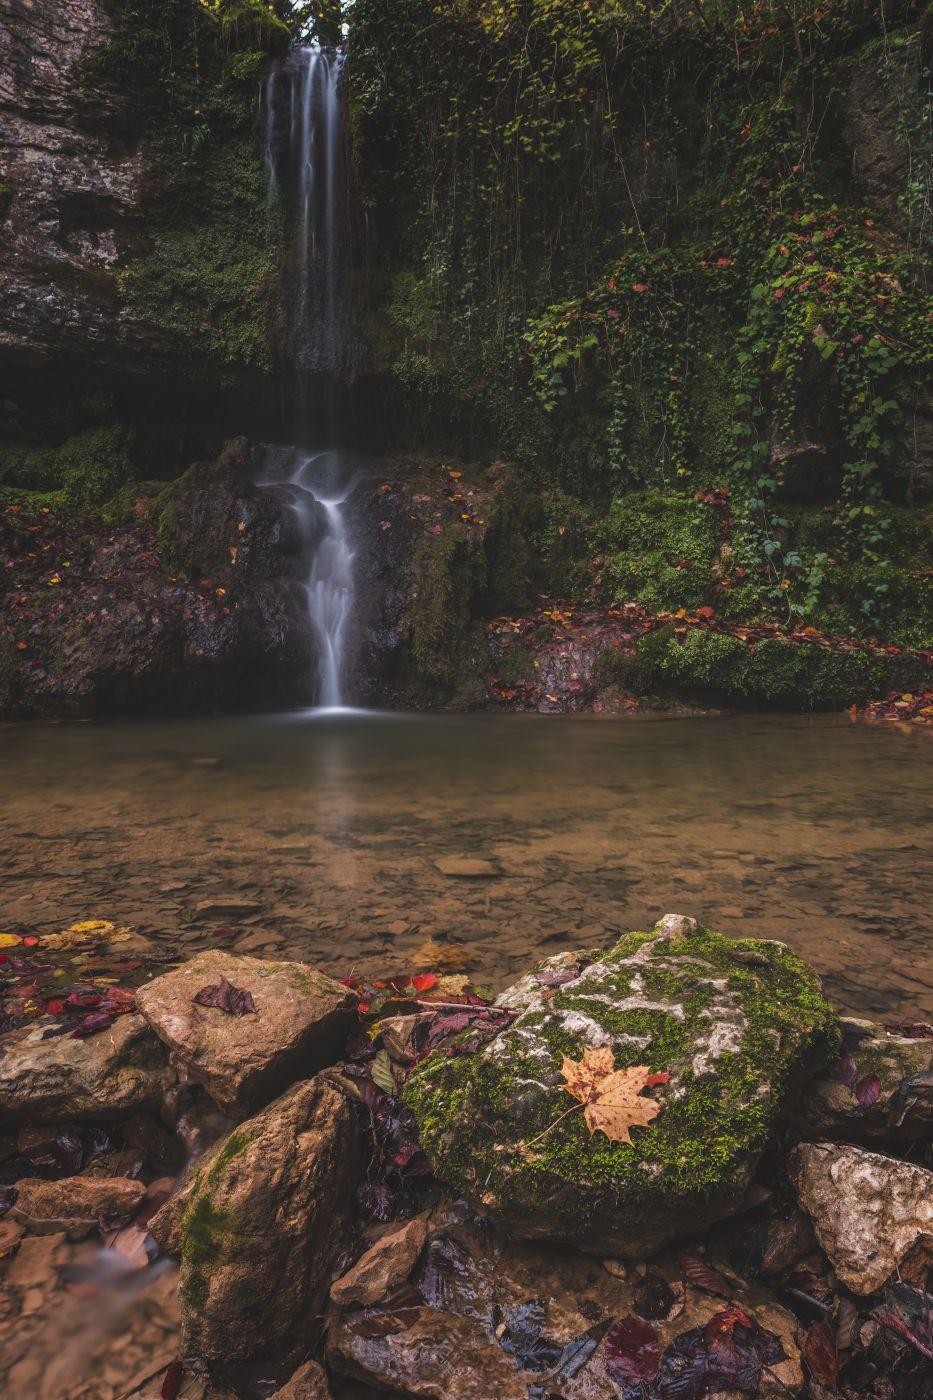 Linnbach Wasserfall, Switzerland